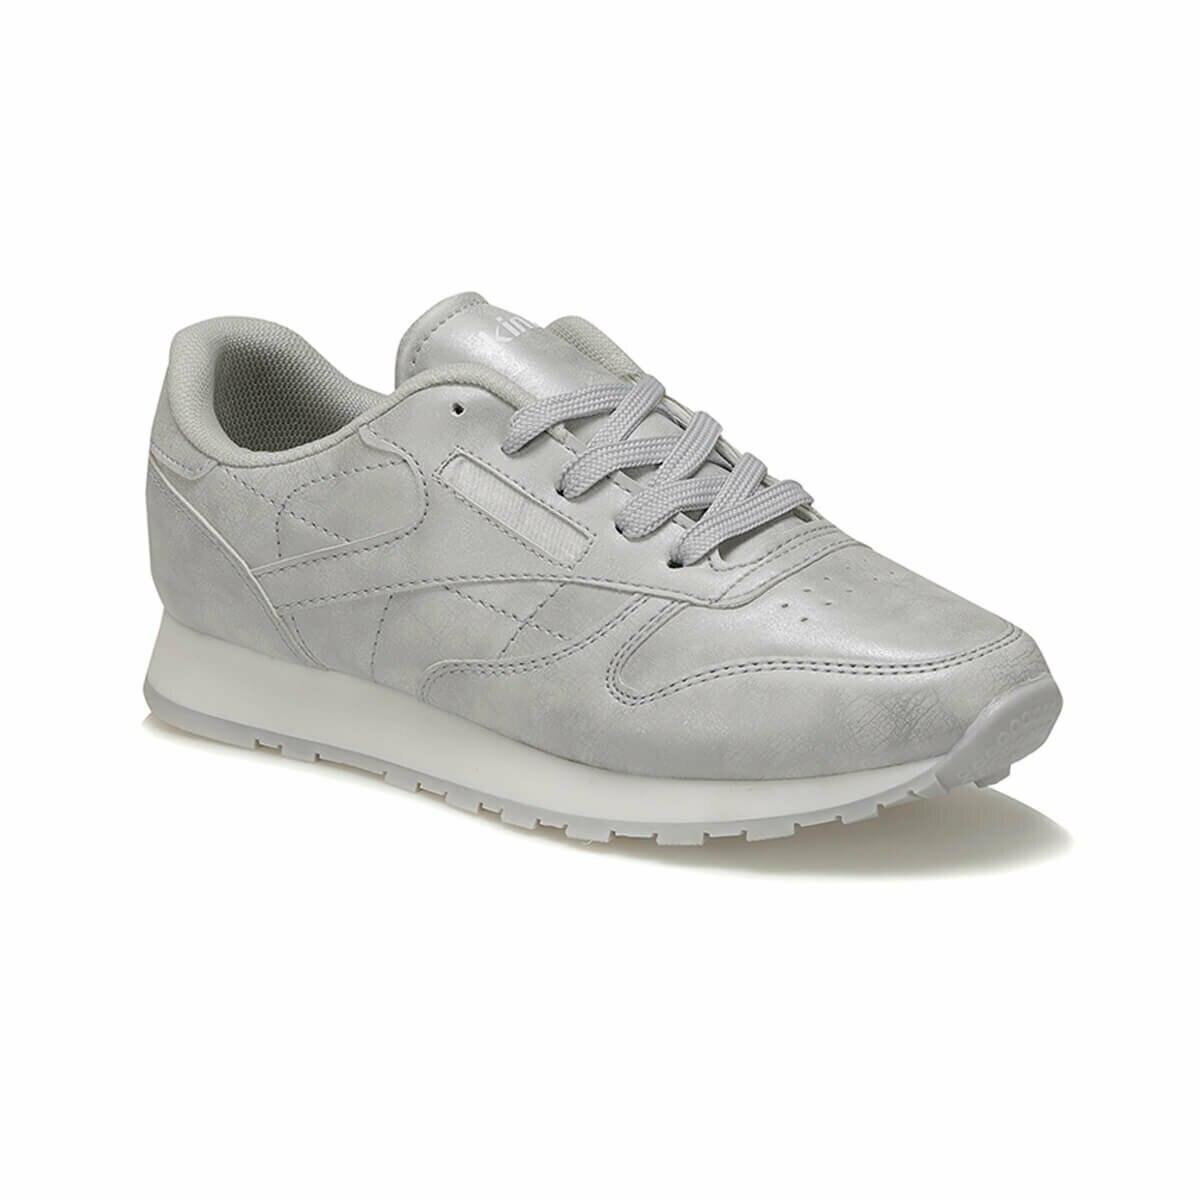 FLO PINTO Gray Women 'S Sports Shoes KINETIX